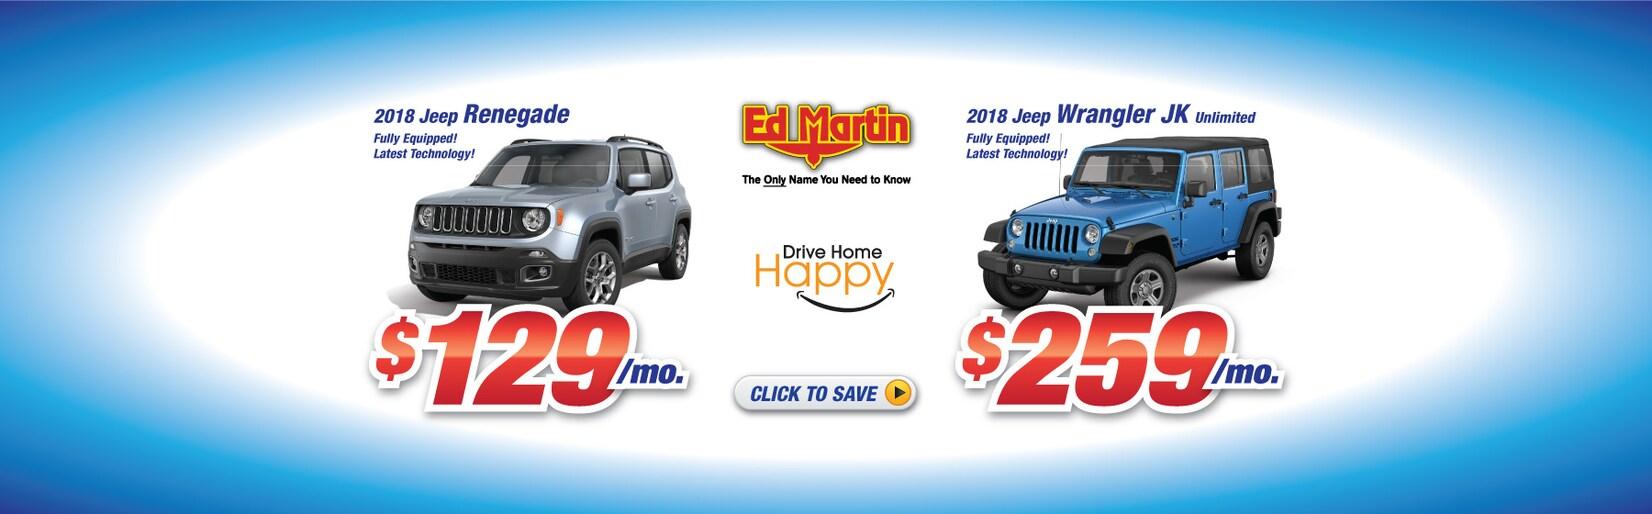 Martin Tire Muncie >> Ed Martin New 2017-2018 Chrysler Dodge Jeep RAM & Used Car Dealer in Anderson IN | Near ...